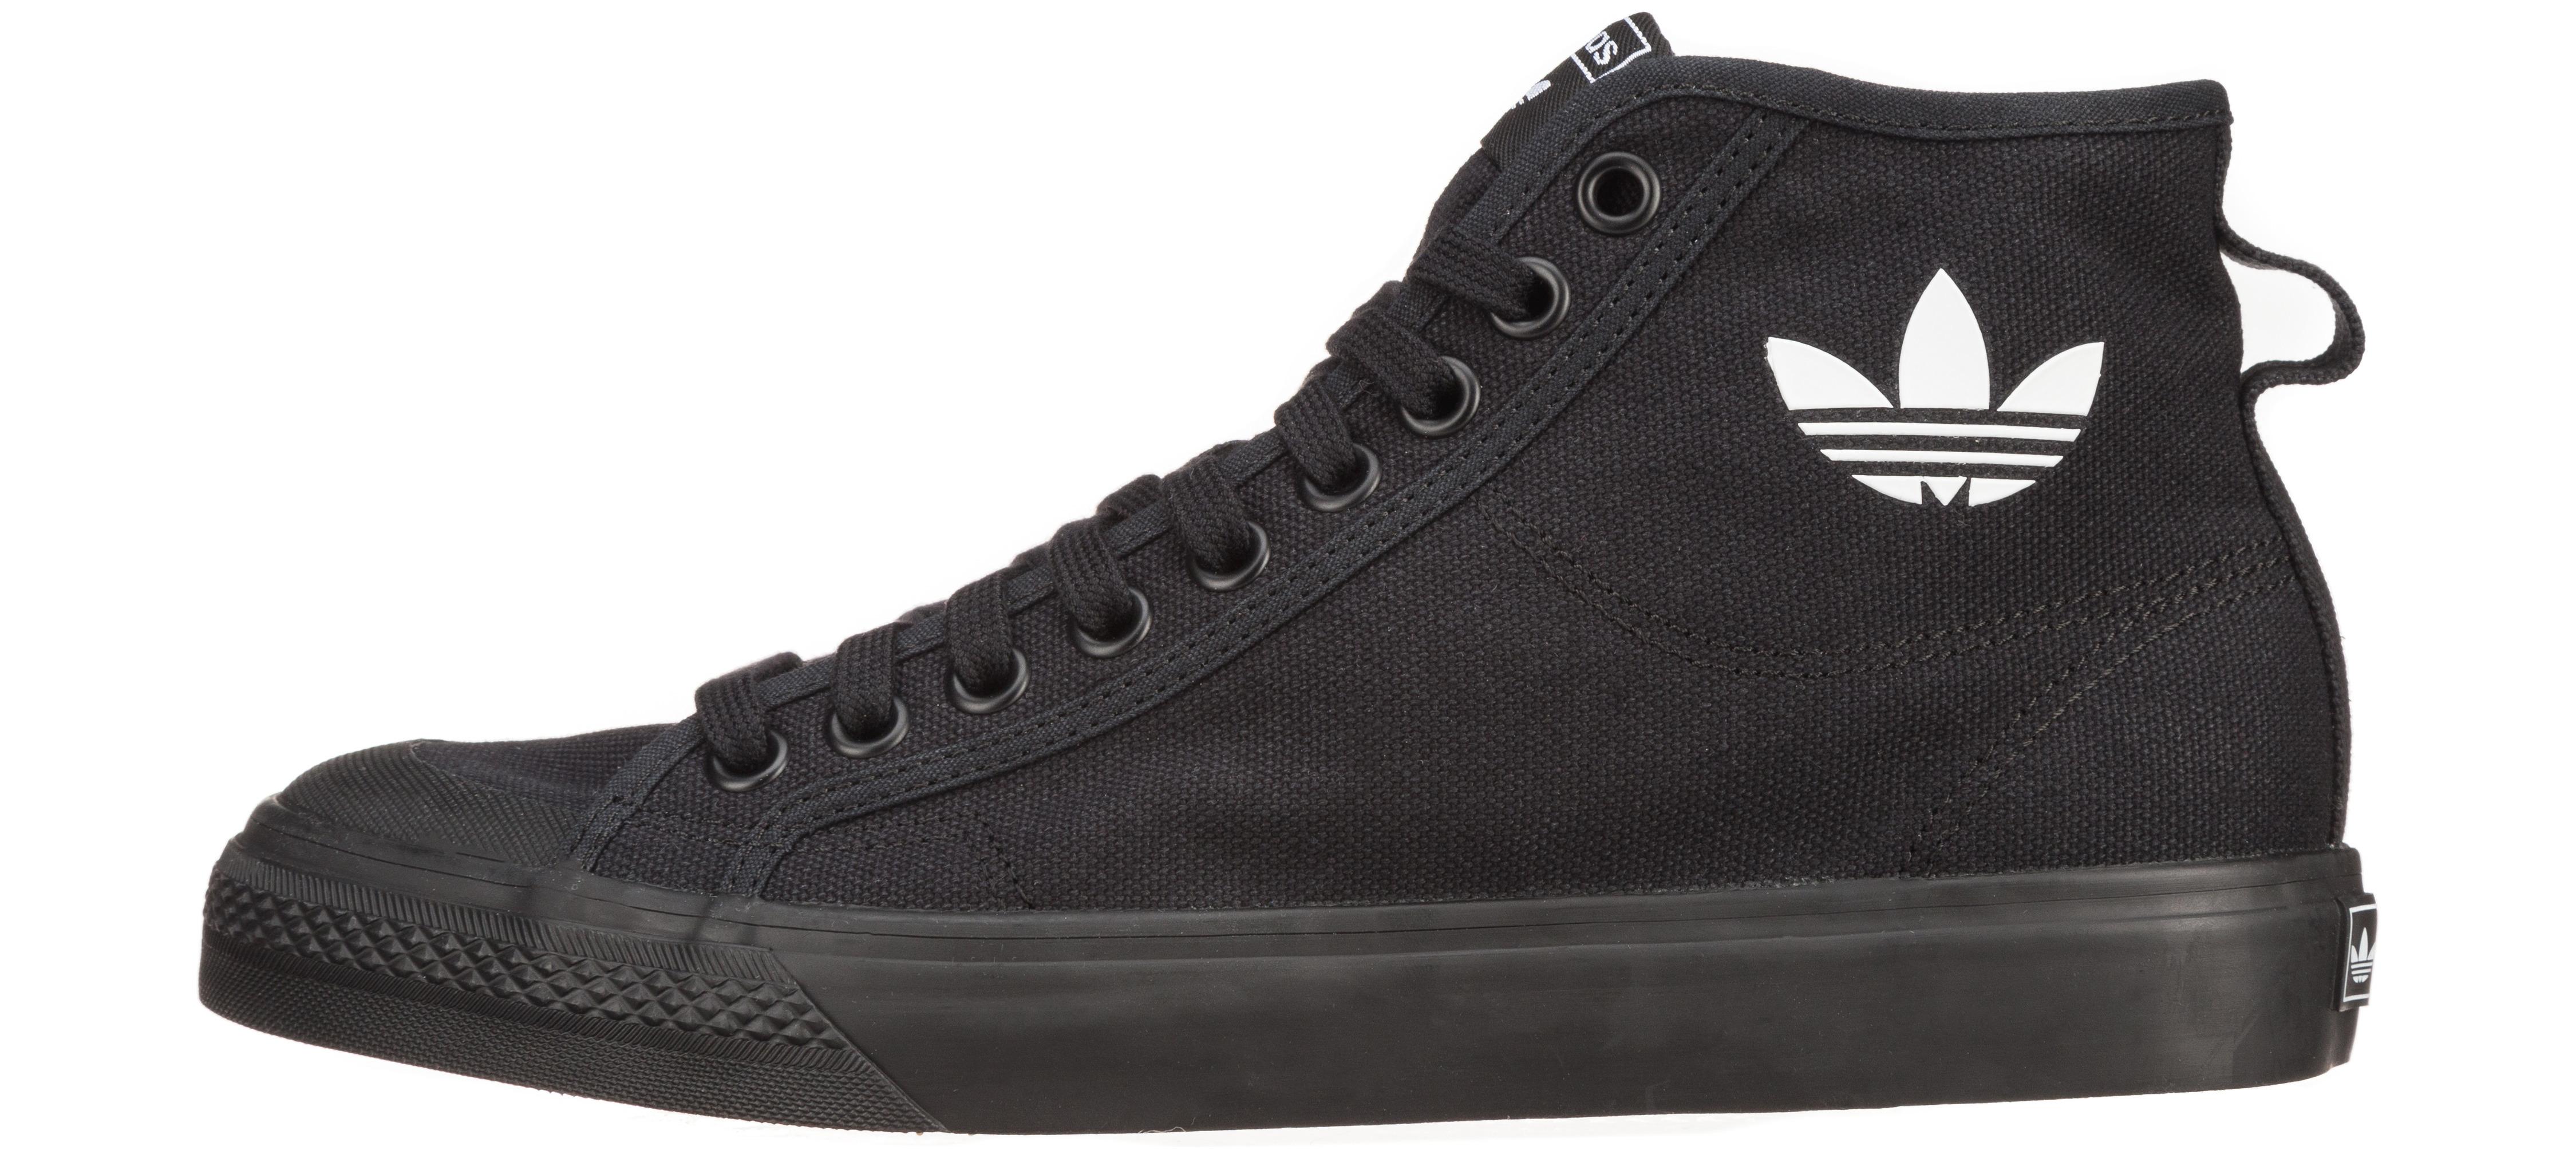 adidas Originals Nizza High Tenisky Čierna - Glami.sk 89a67c7cbb3